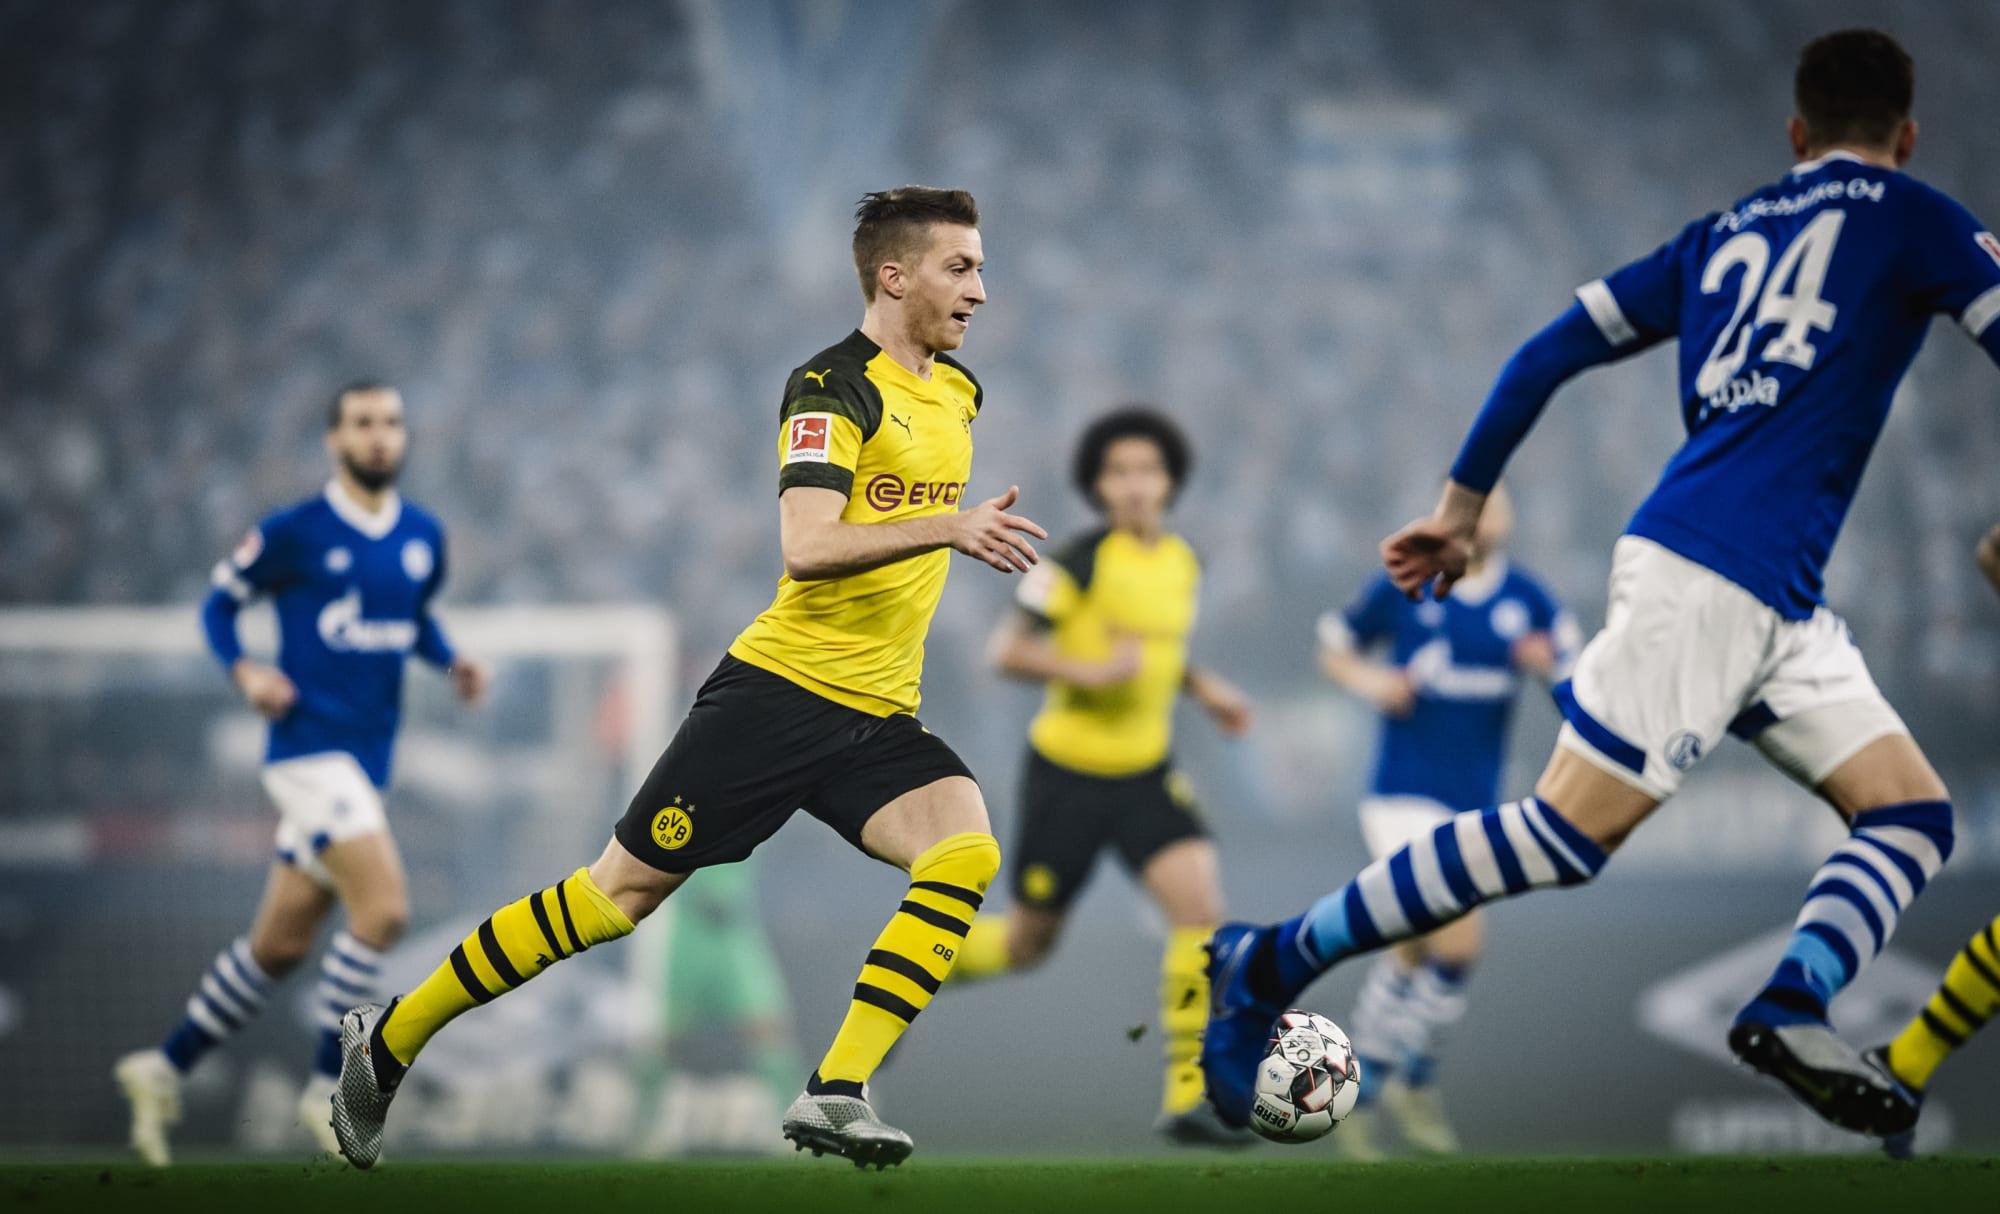 How to watch Borussia Dortmund vs Schalke 04: Live Stream, TV Channel for Bundesliga match